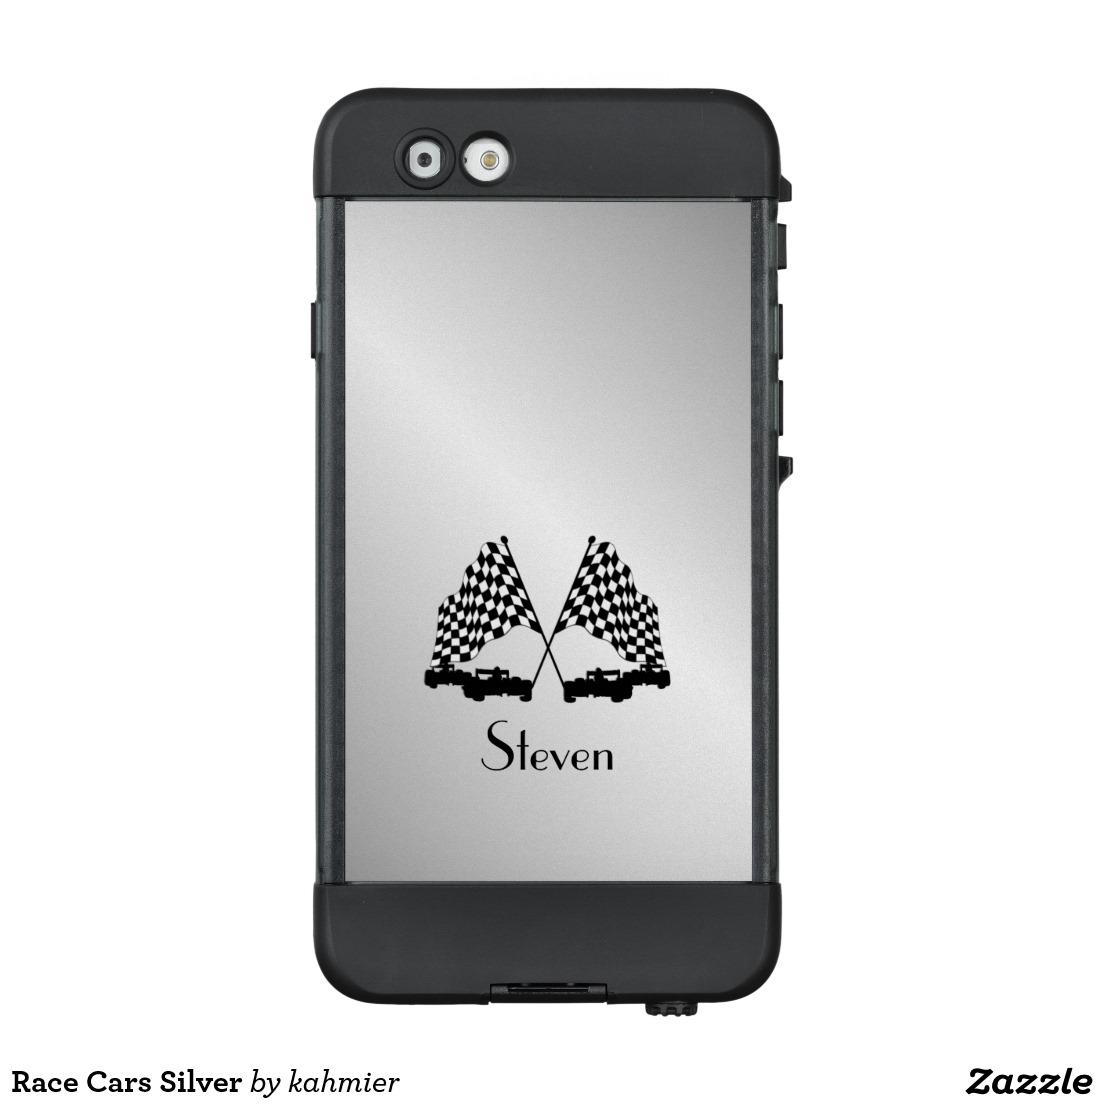 Race Cars Silver LifeProof® NÜÜD® iPhone 6 Case